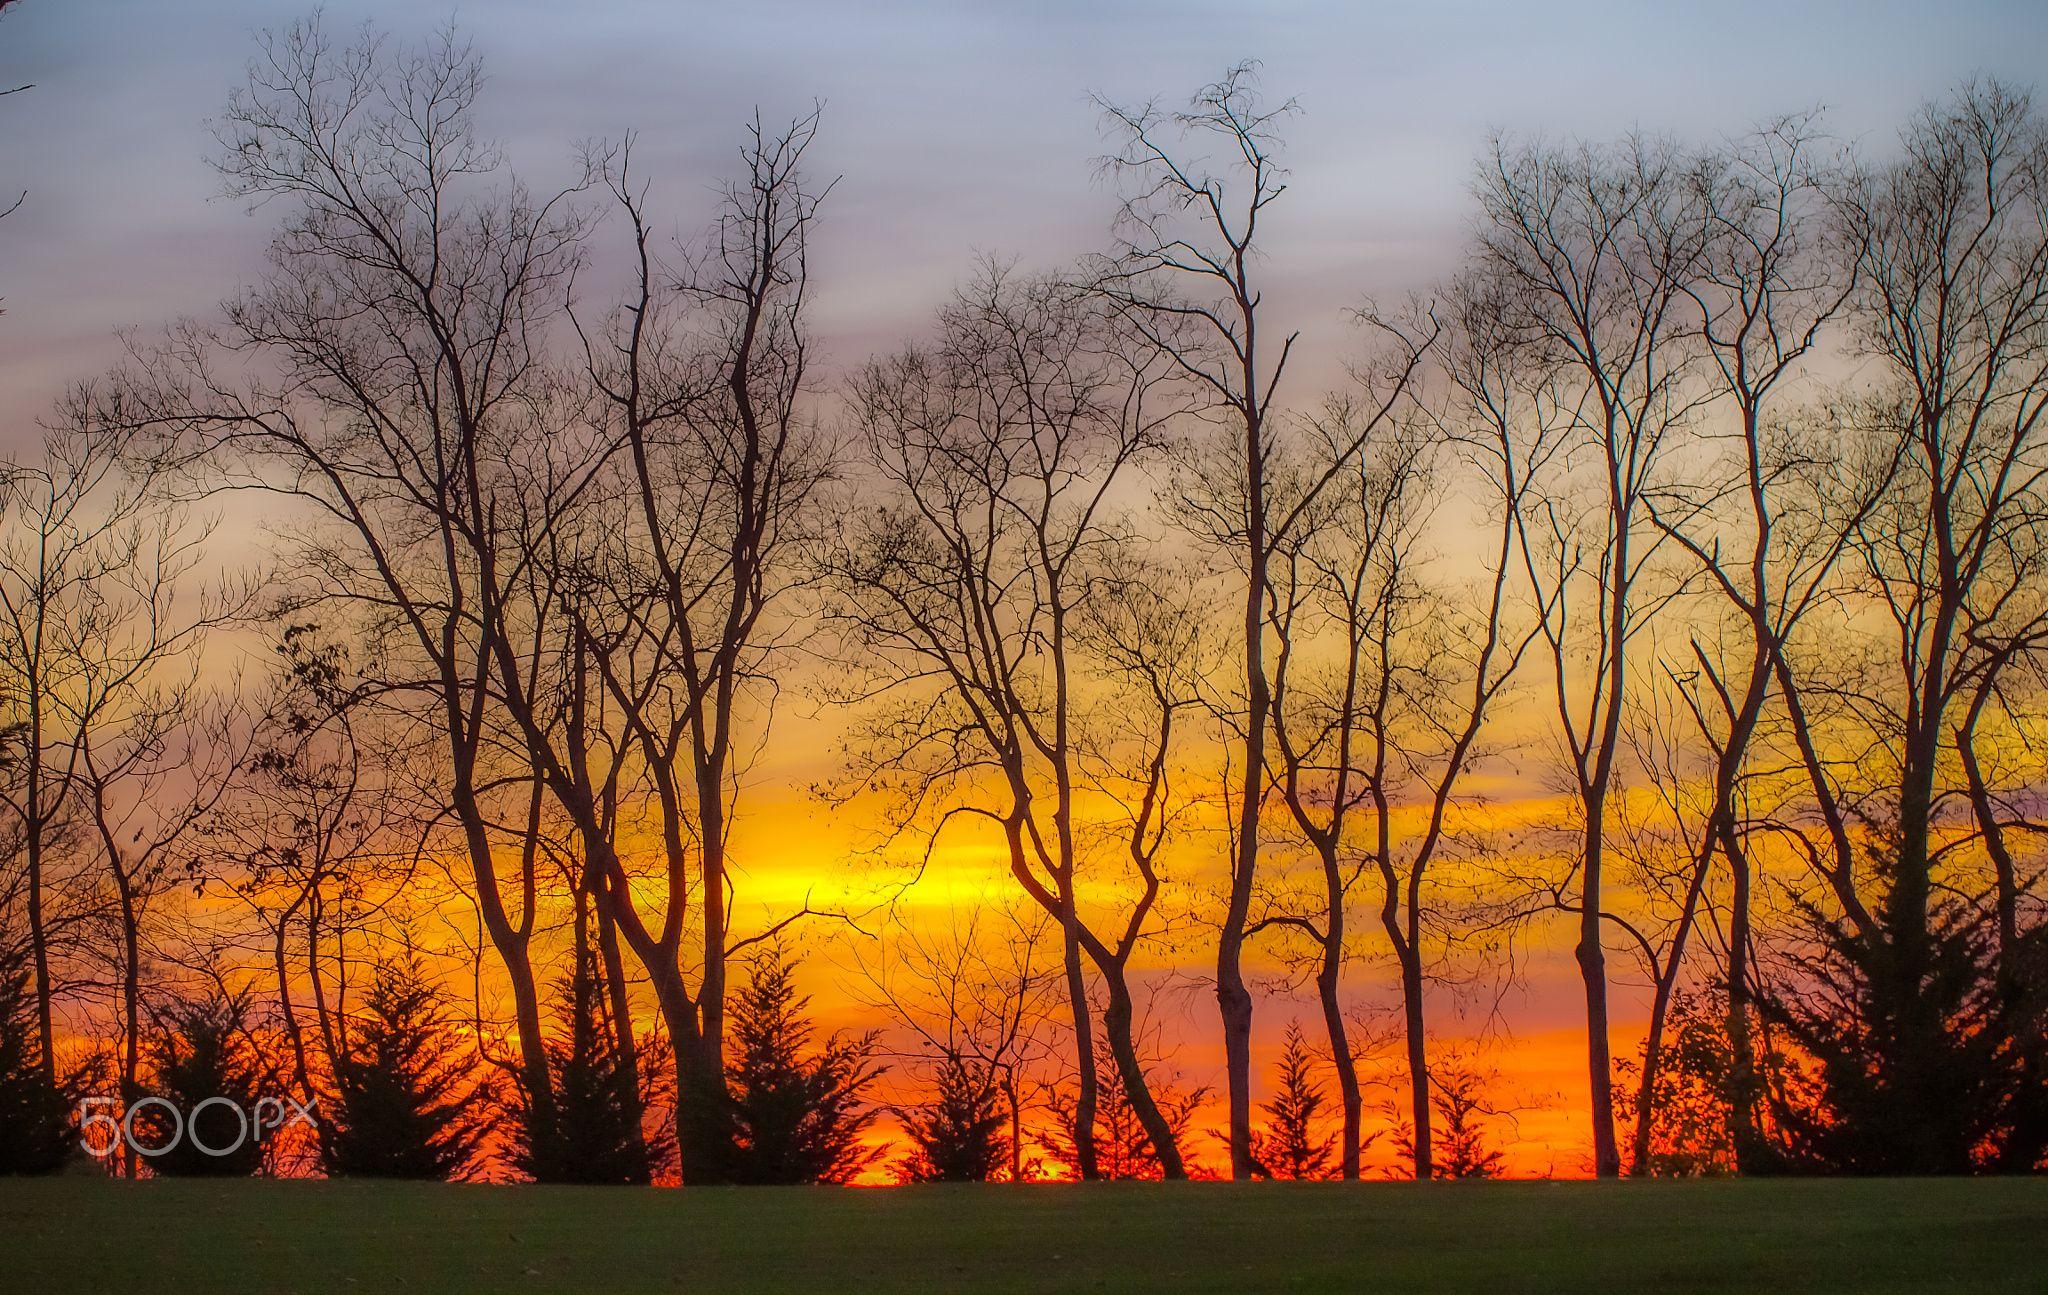 Sunset Thanksgiving Day - OLYMPUS DIGITAL CAMERA